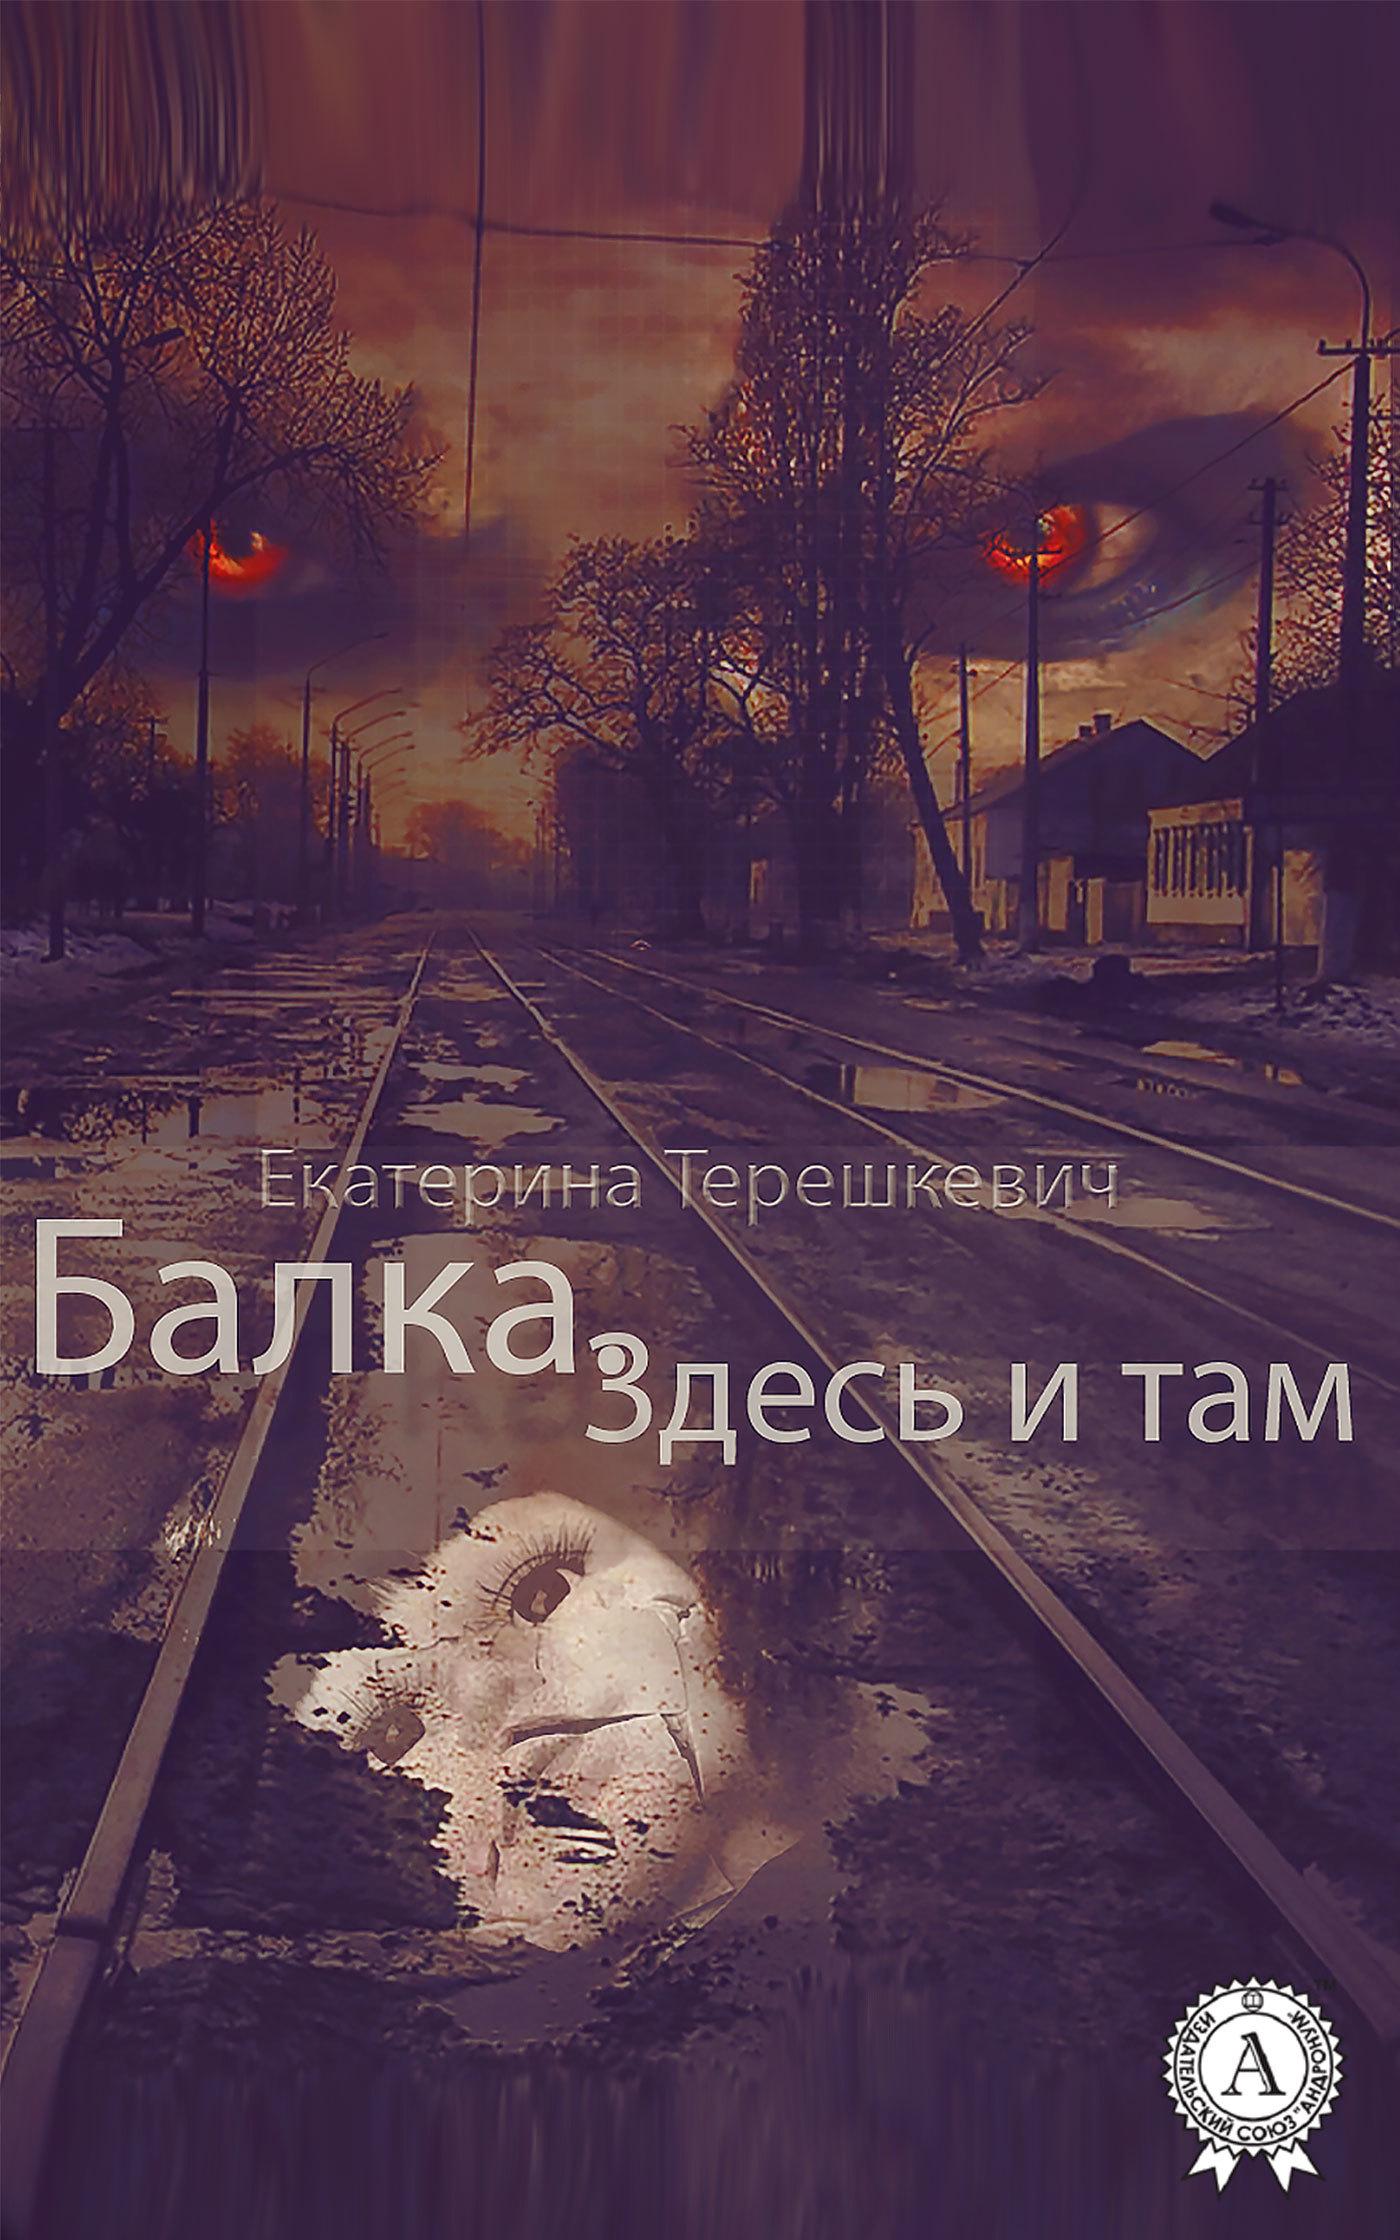 Екатерина Терешкевич бесплатно